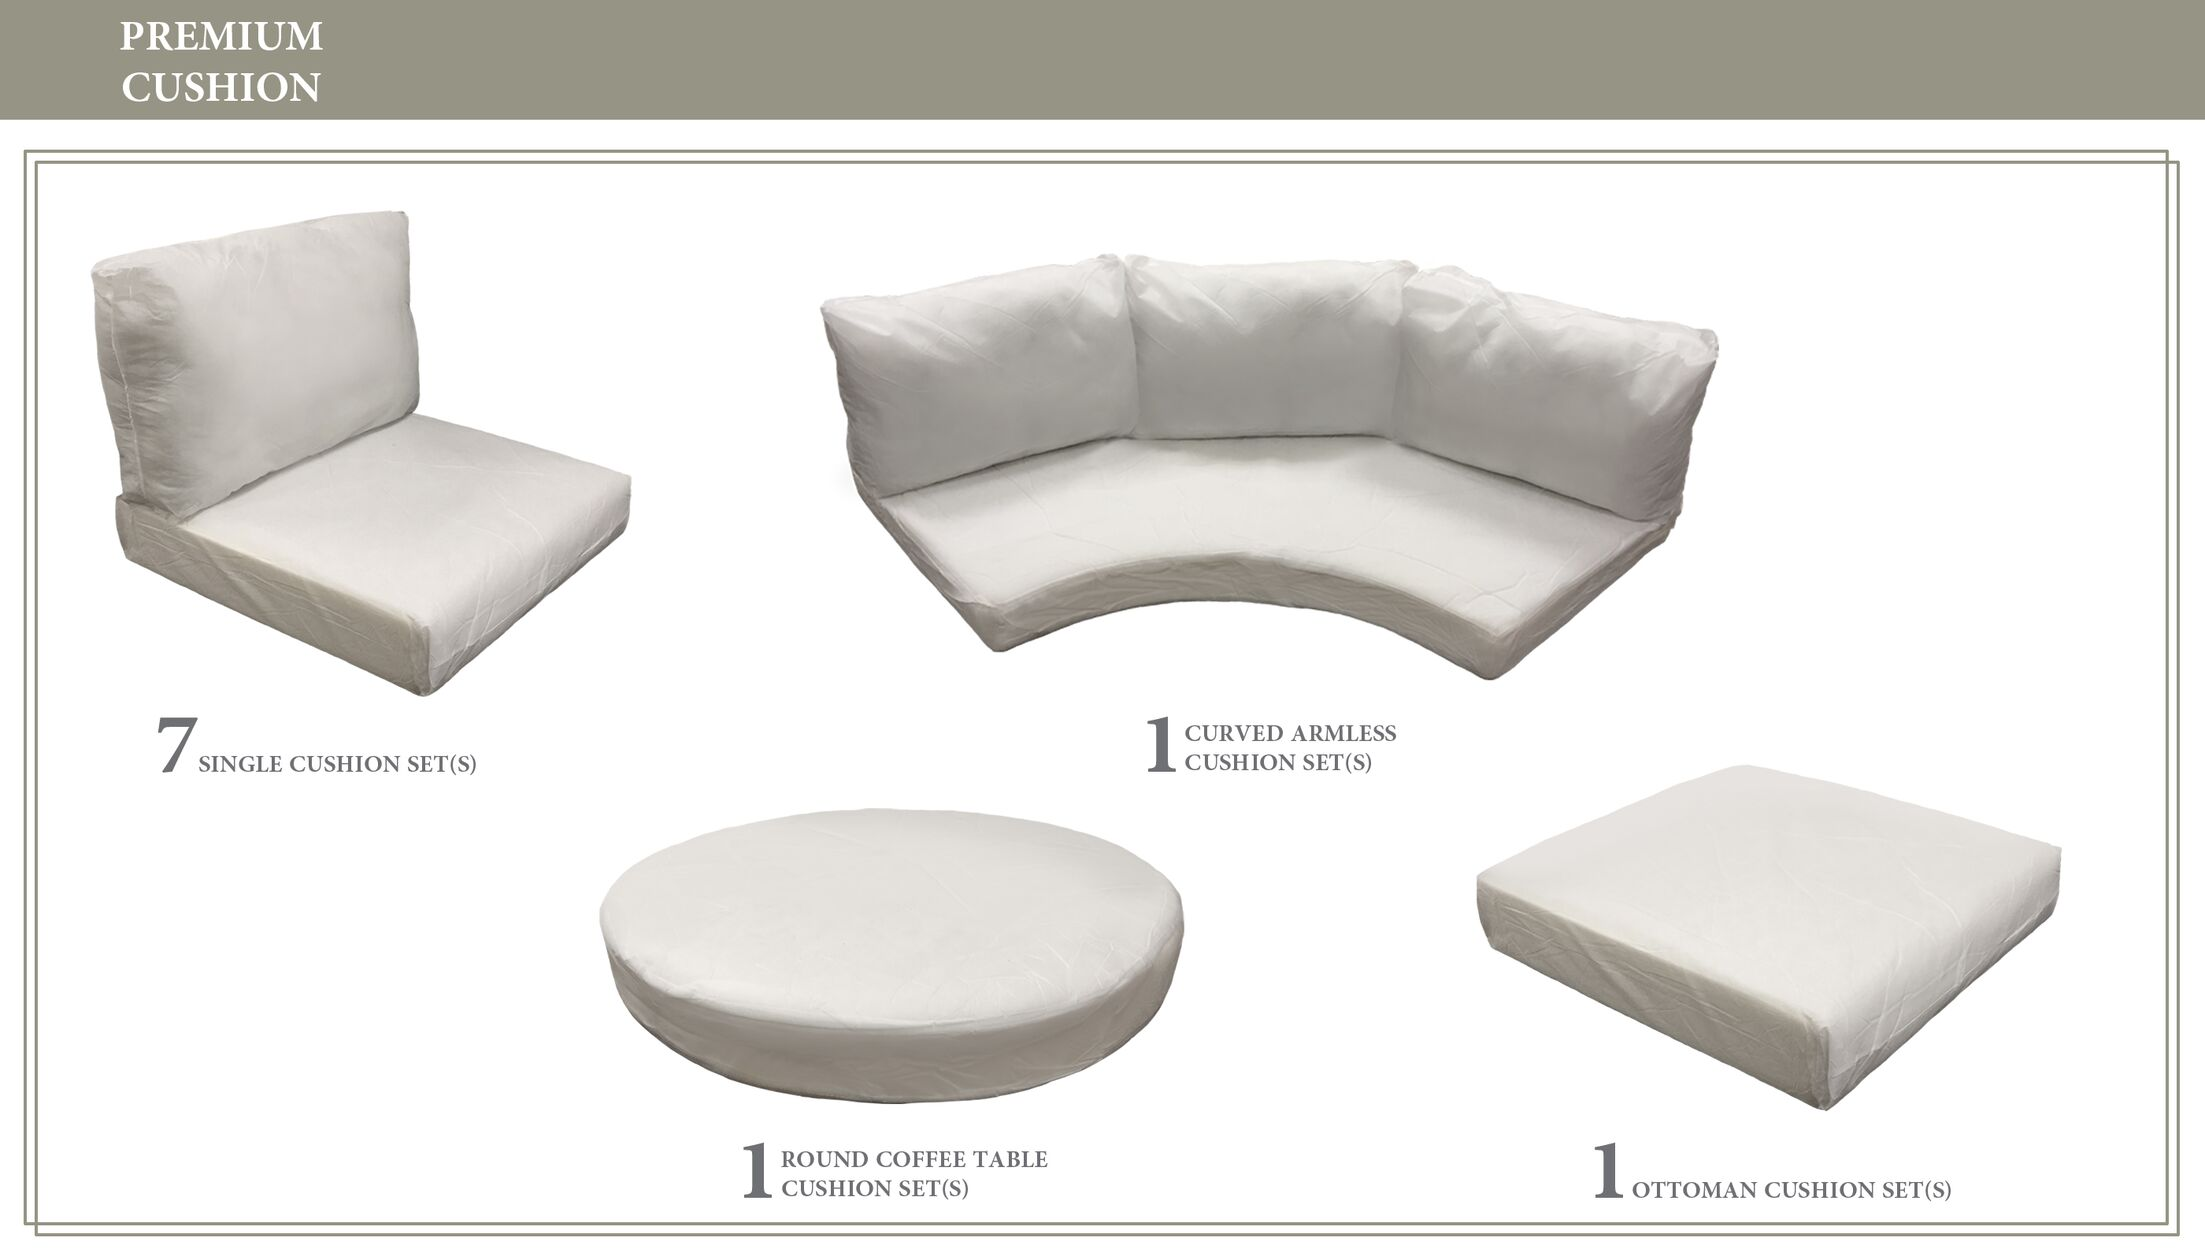 Fairmont Outdoor 20 Piece Lounge Chair Cushion Set